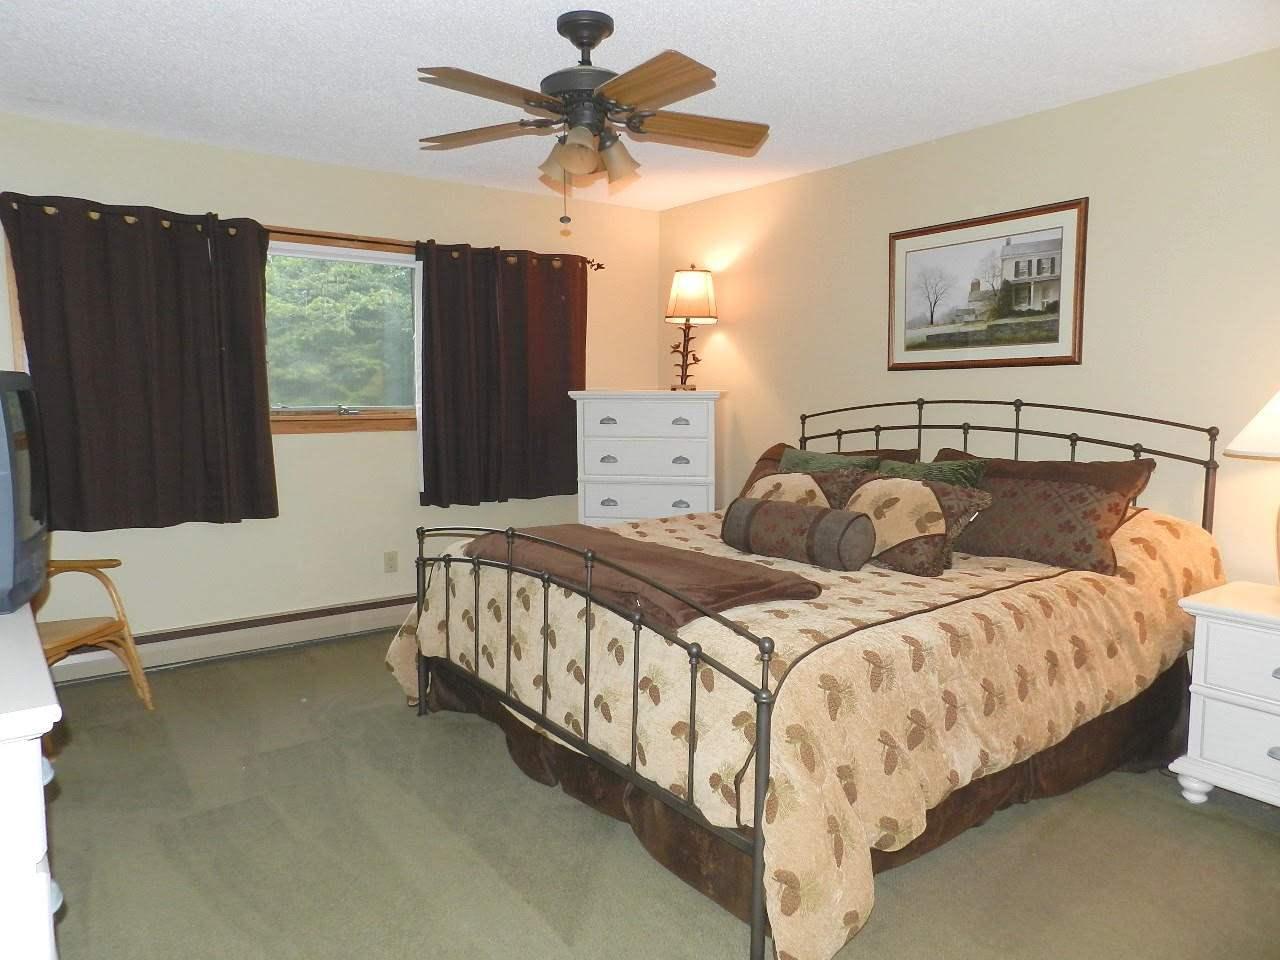 Mount-Snow-Real-Estate-4624619-2